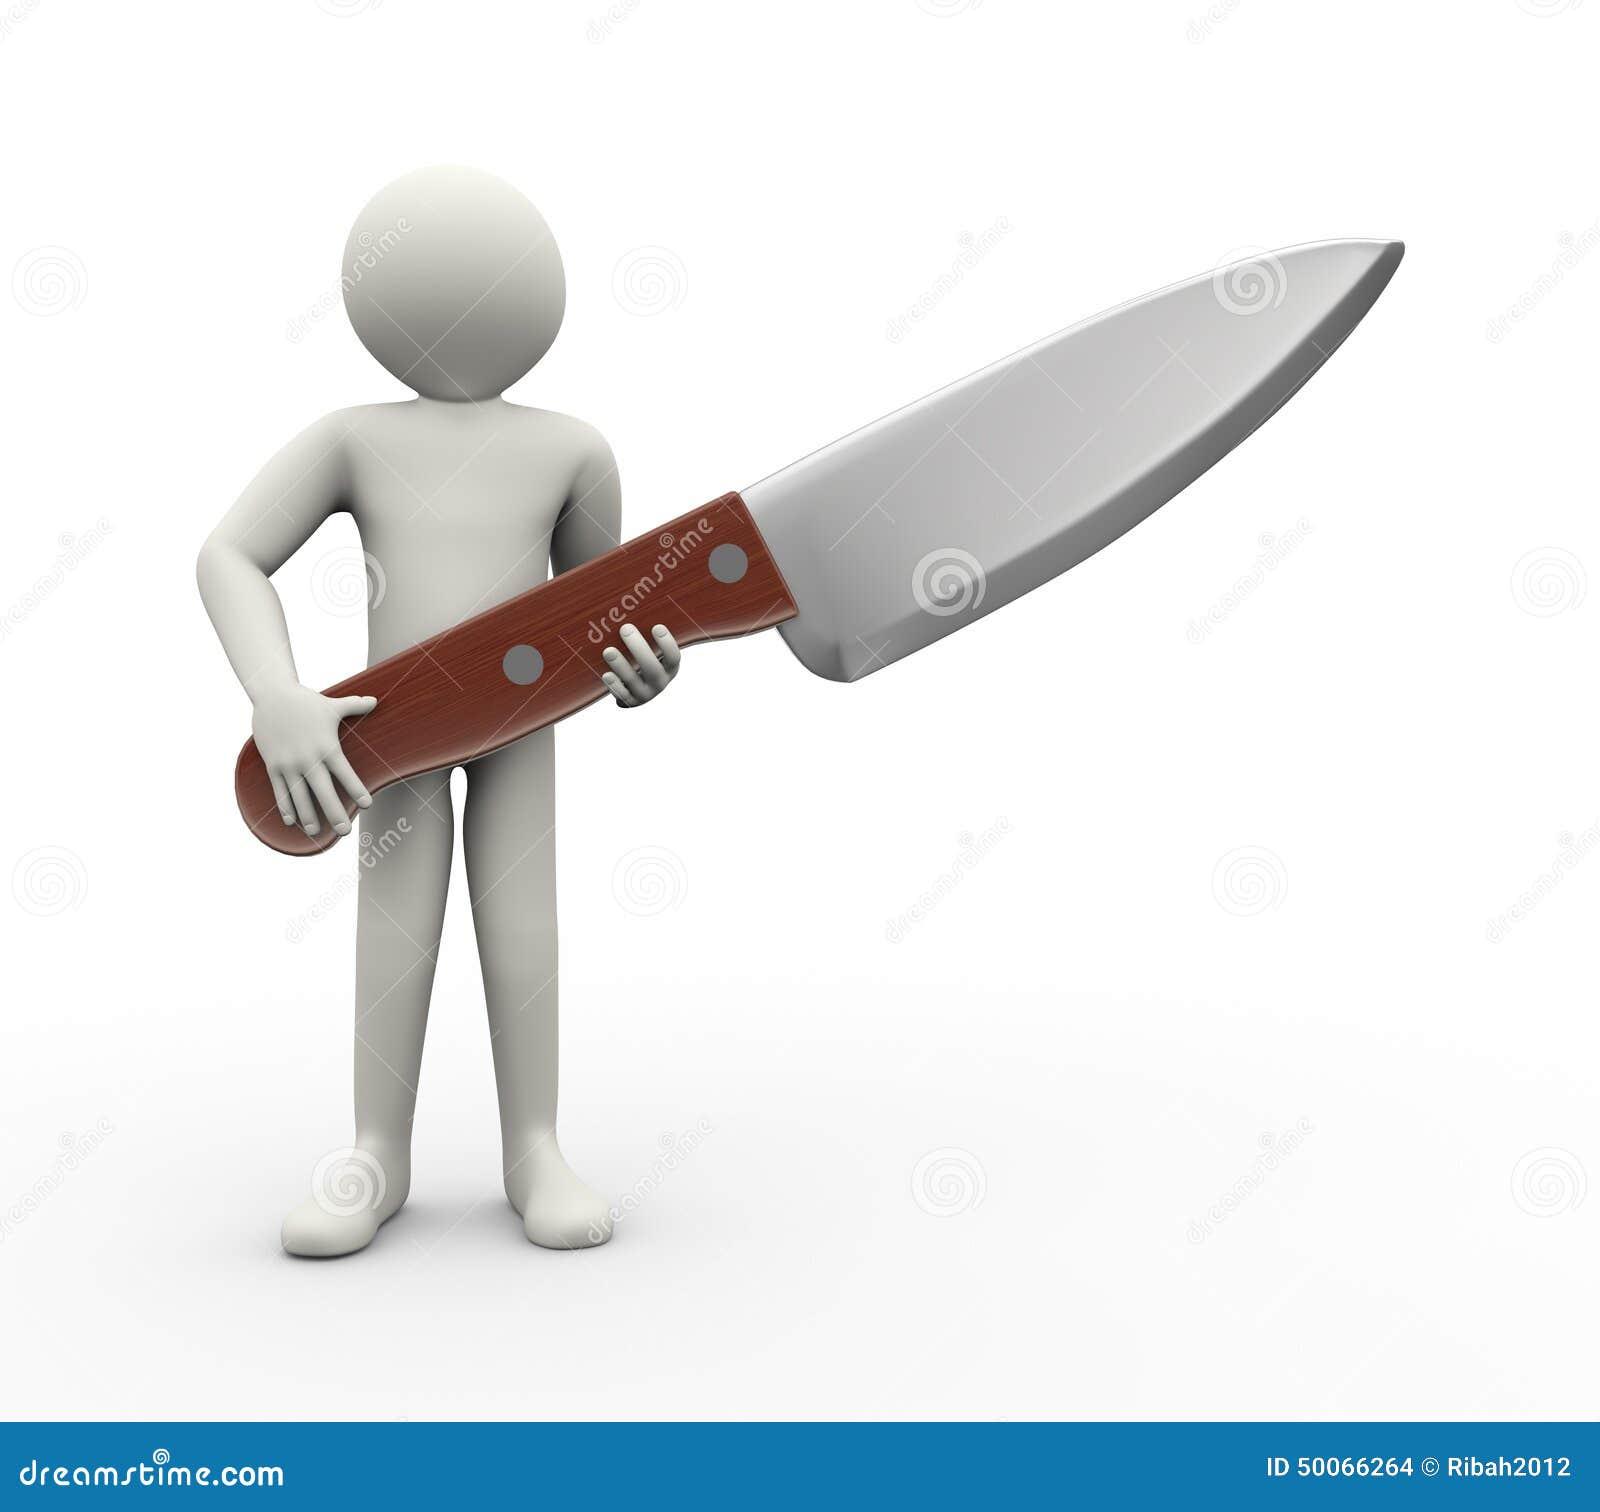 100 Large Kitchen Knives Magnetic Knife RacksDamascus 9008 Black Forge